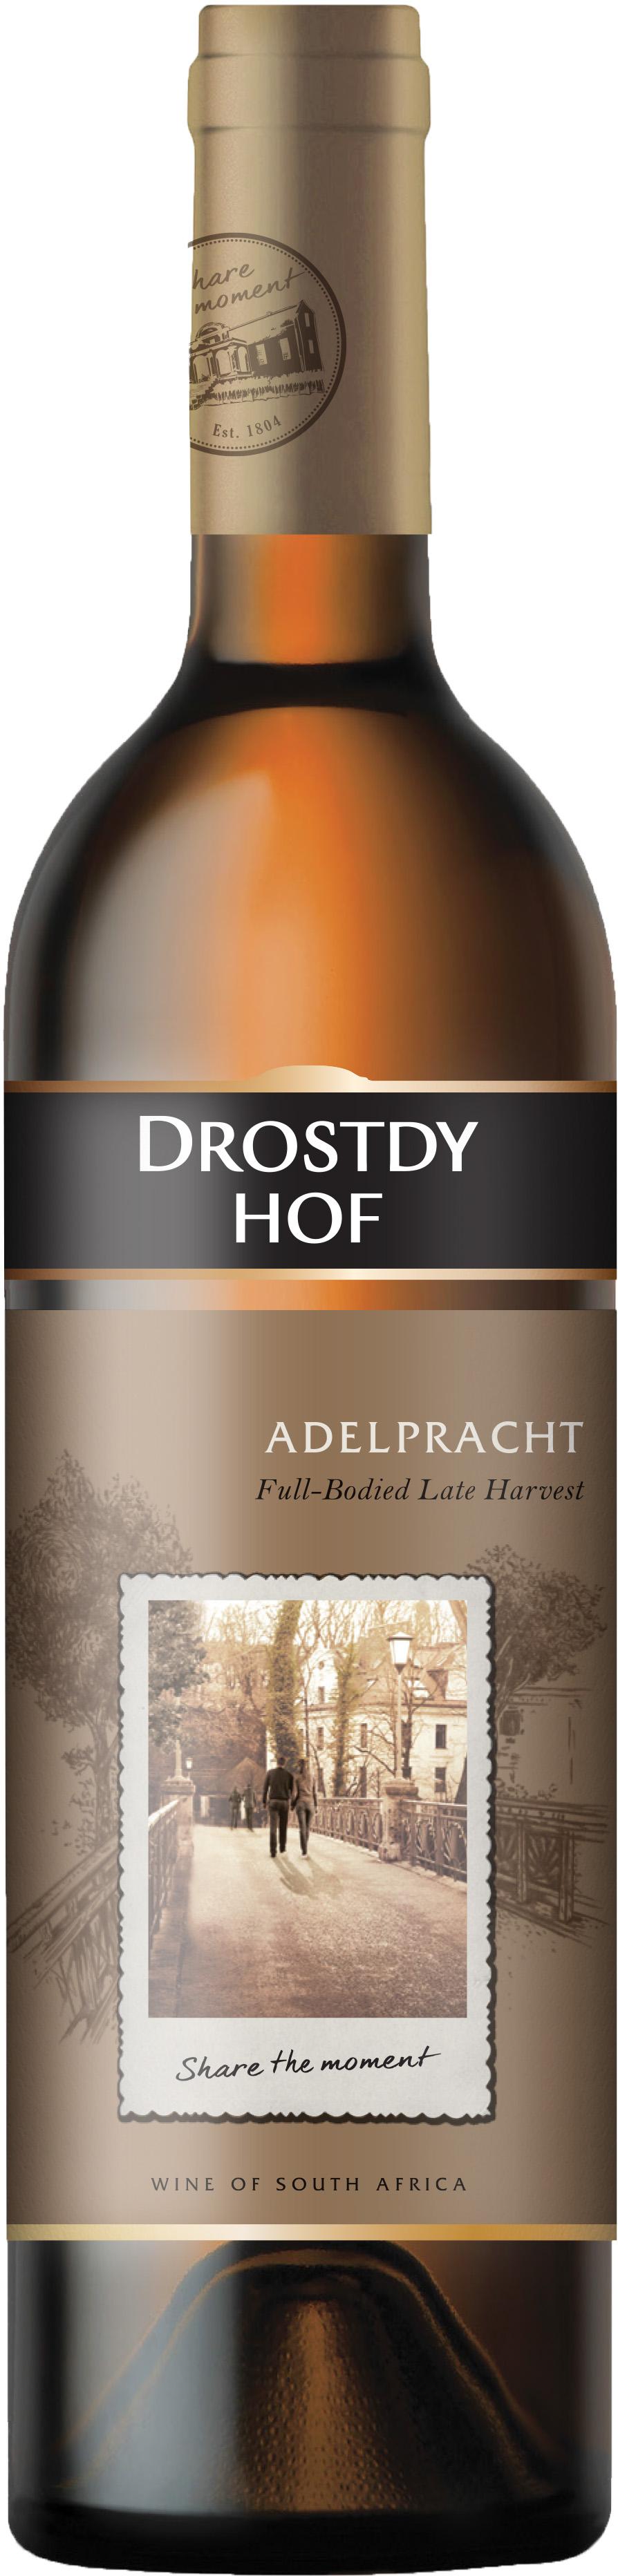 Drostdy Hof Adelpracht